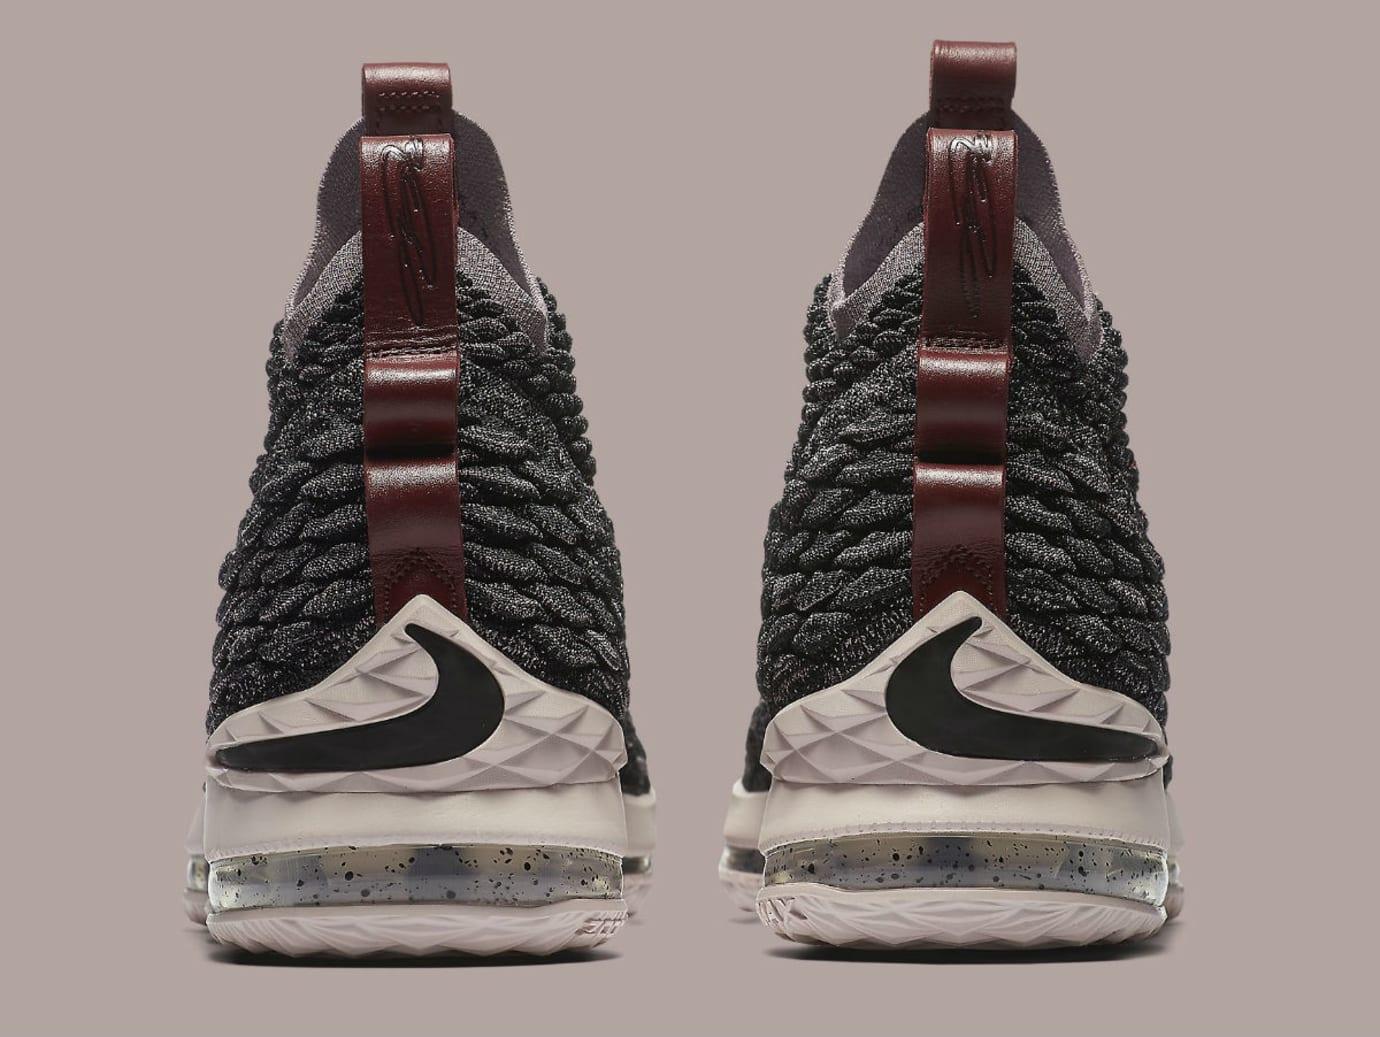 Nike LeBron 15 Pride of Ohio Release date 897648-003 Heel